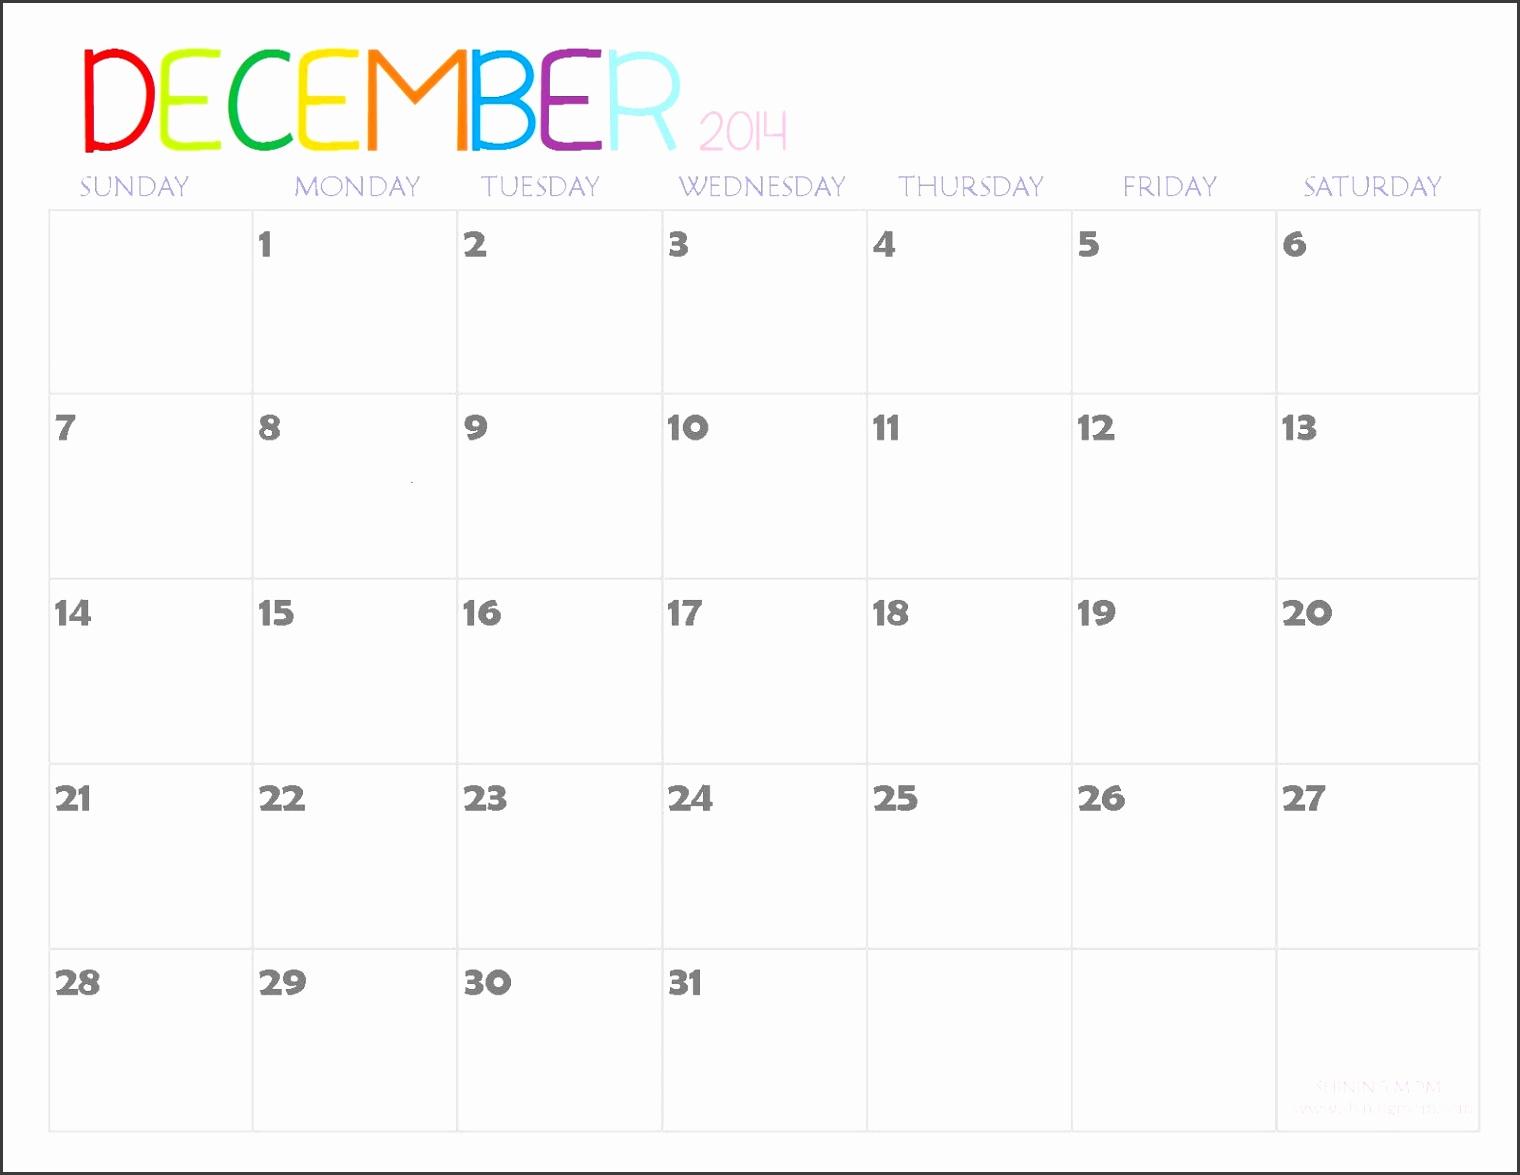 printable december 2014 calendar word template free printable 2014 calendar december